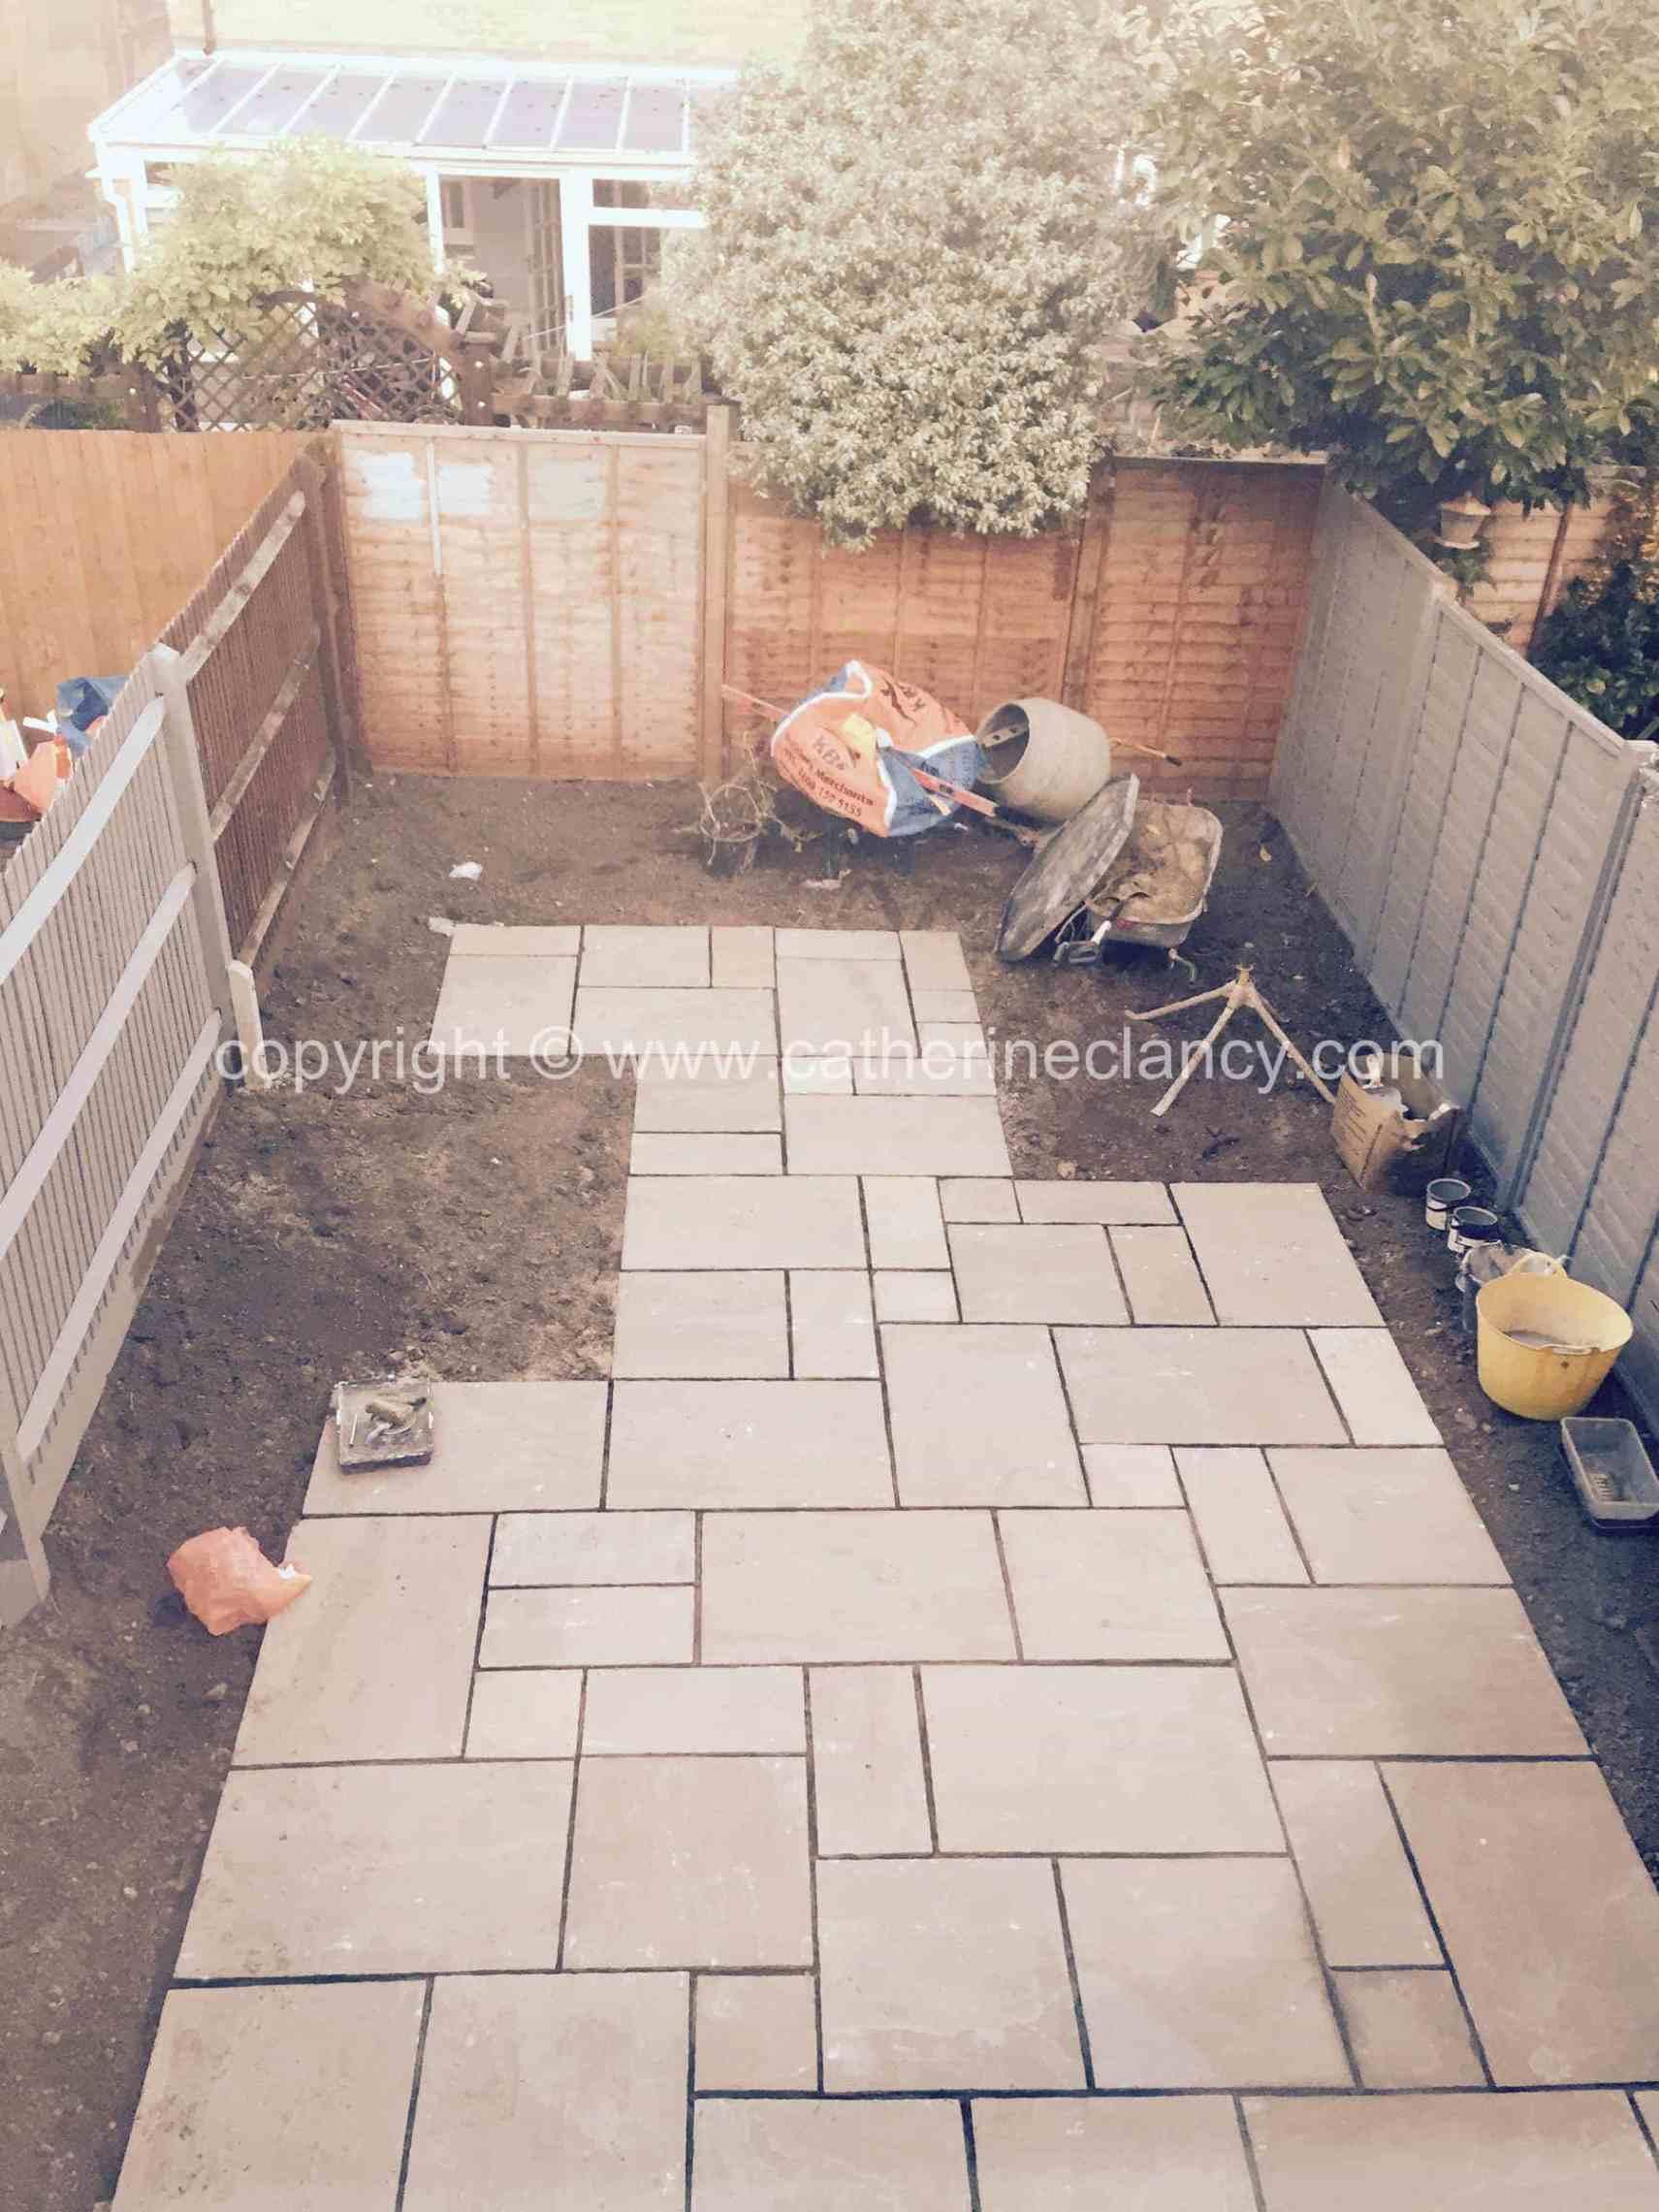 peckham-garden-paving